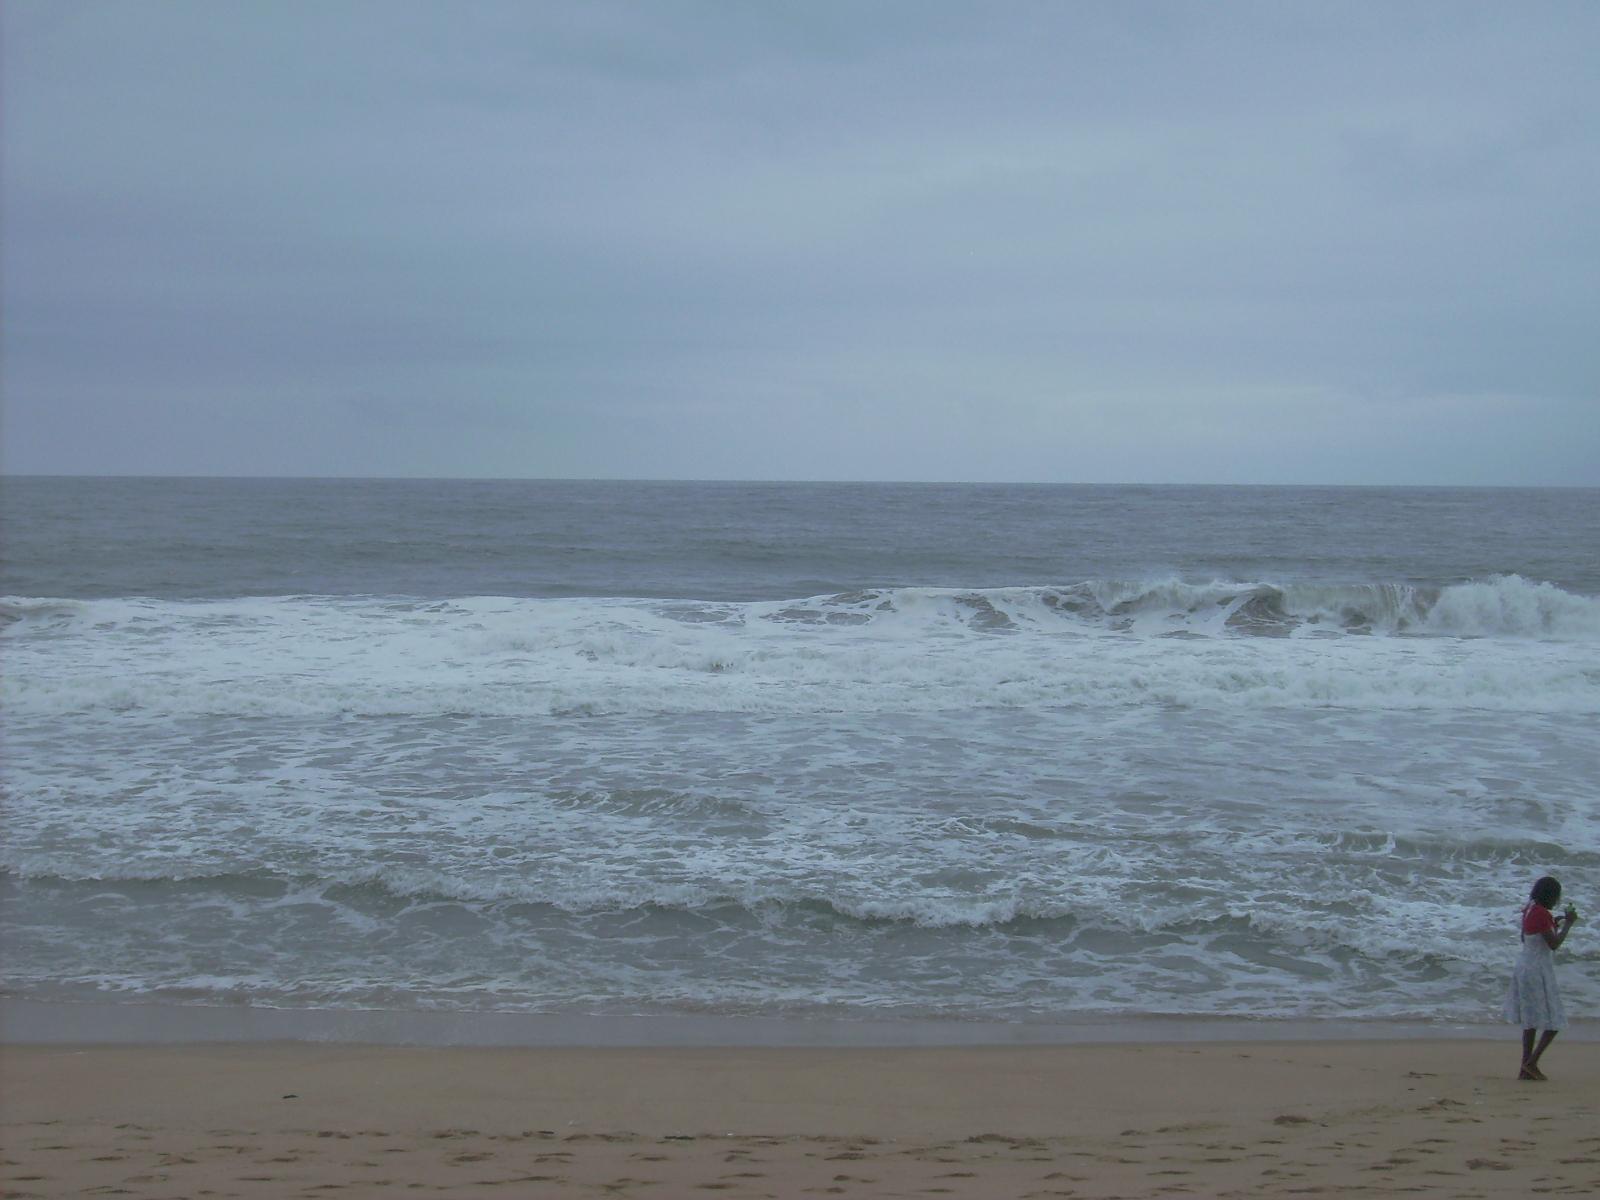 Mar en Abiyán (Costa de Marfil, agosto 2010)